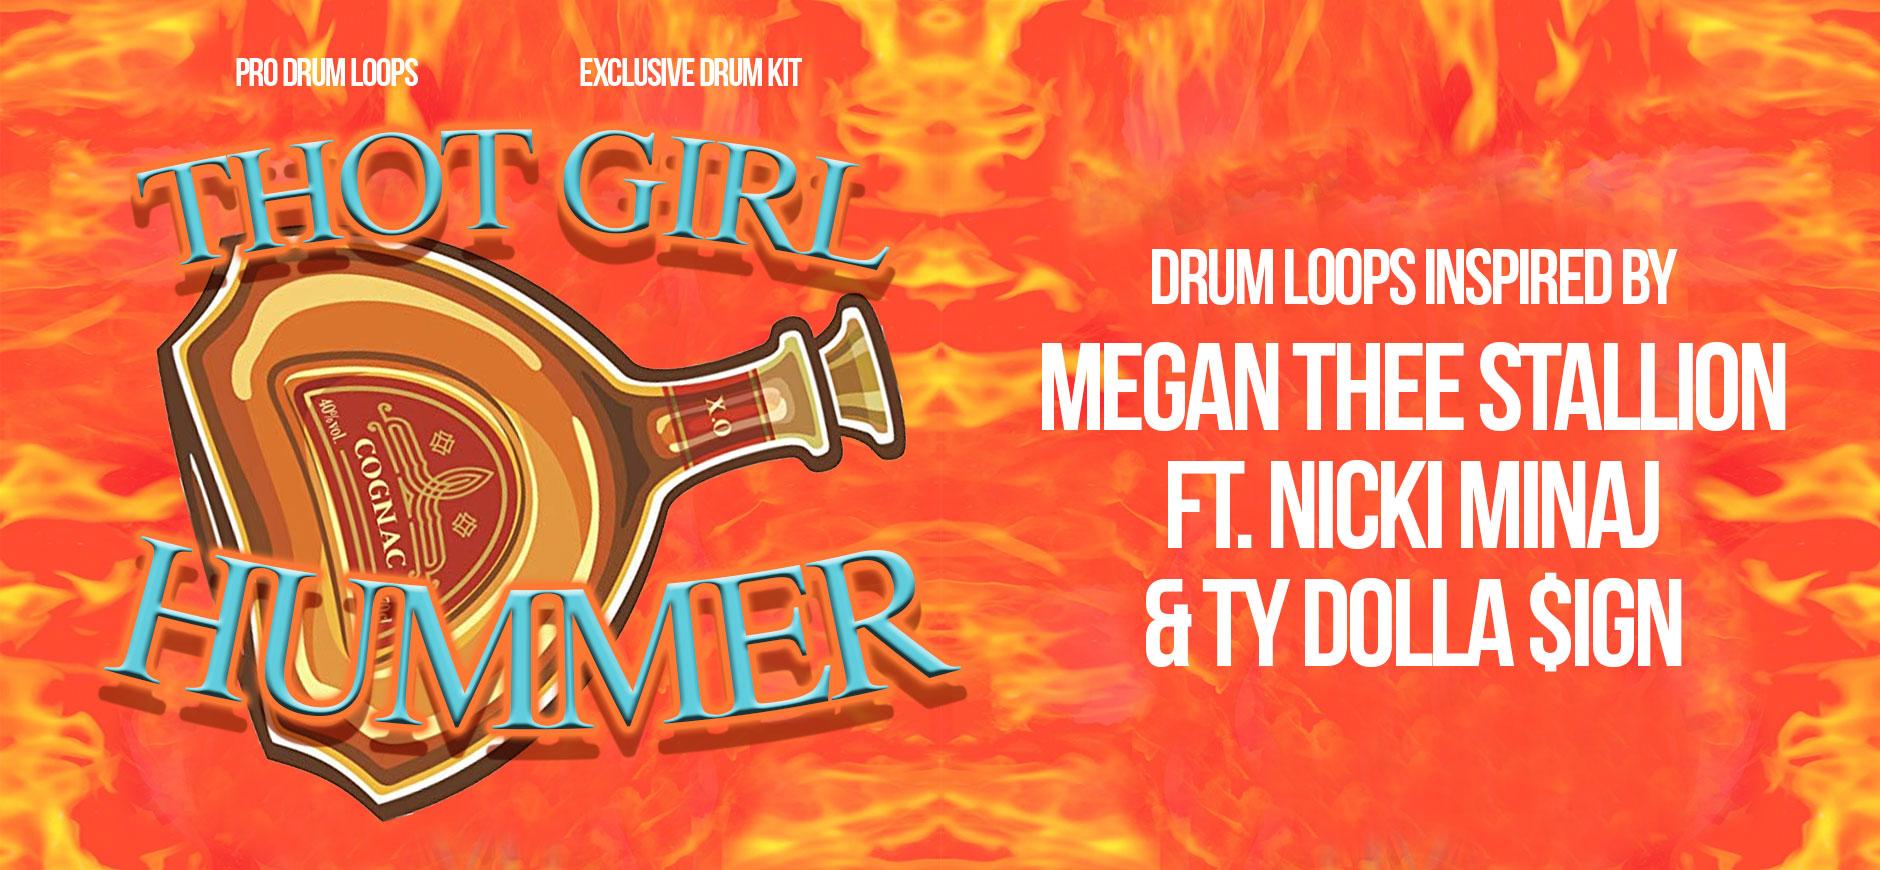 Hot Girl Summer Drum Loops Kit Inspired by Megan Thee Stallion ft. Nicki Minaj & Ty Dolla Sign